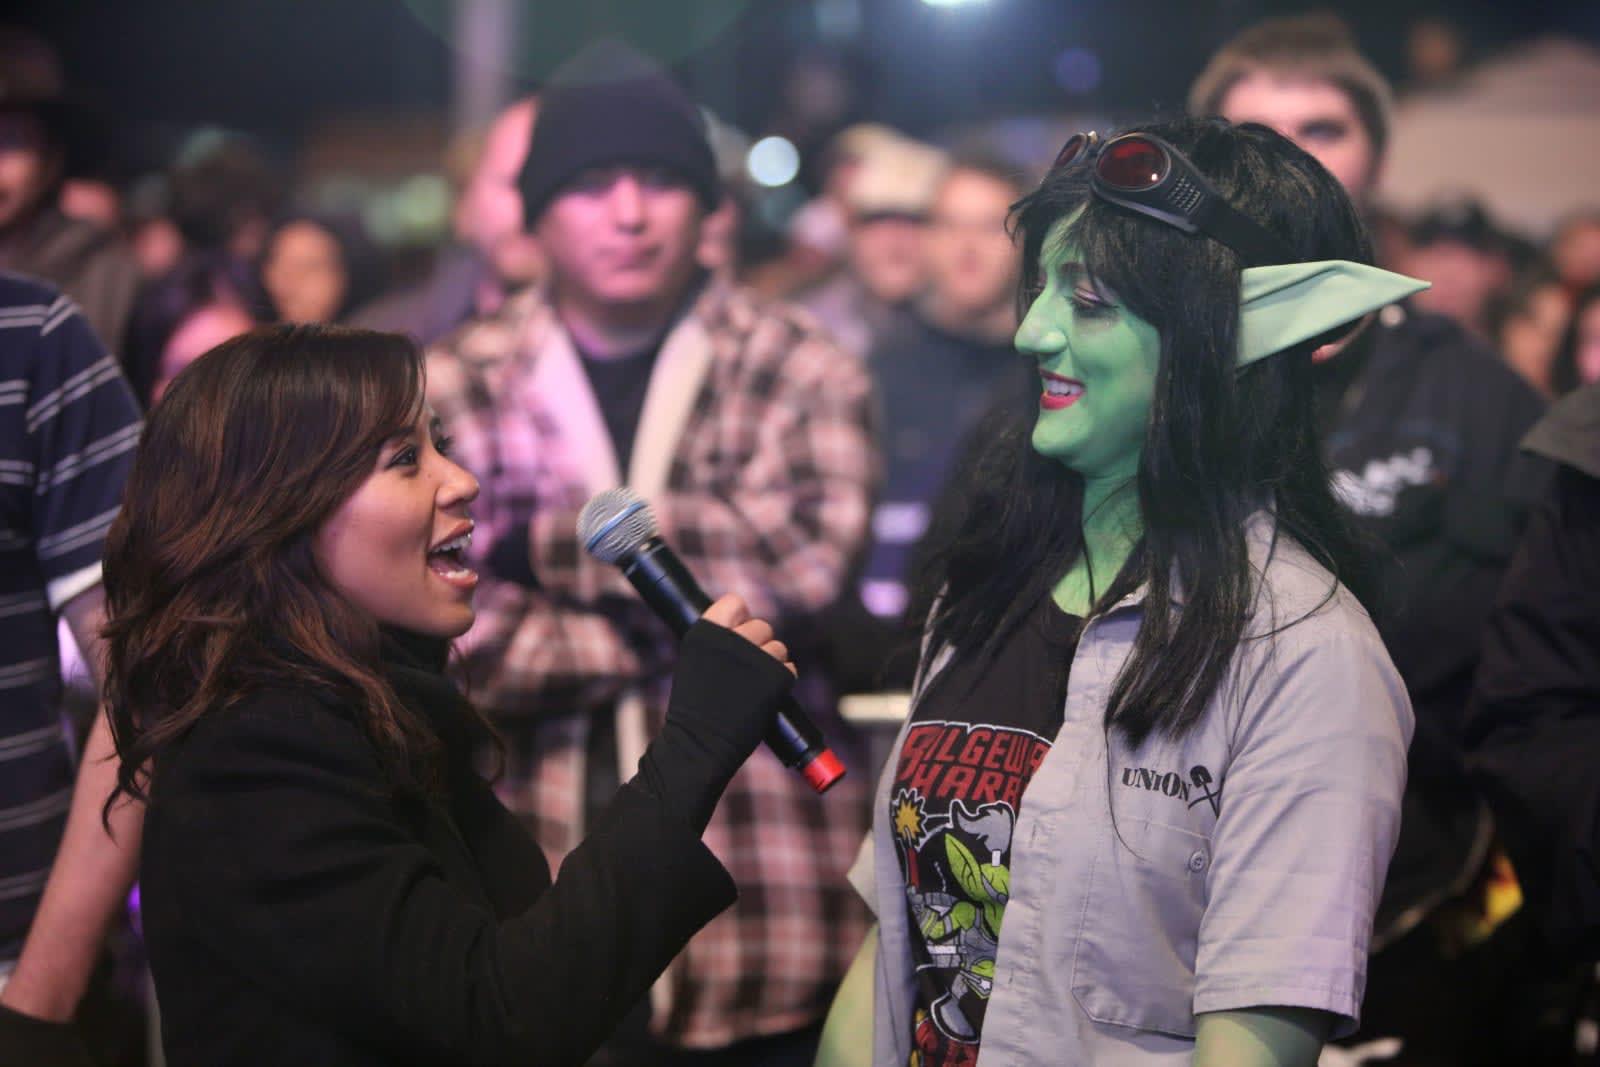 Blizzard's global esports director quits amid turmoil